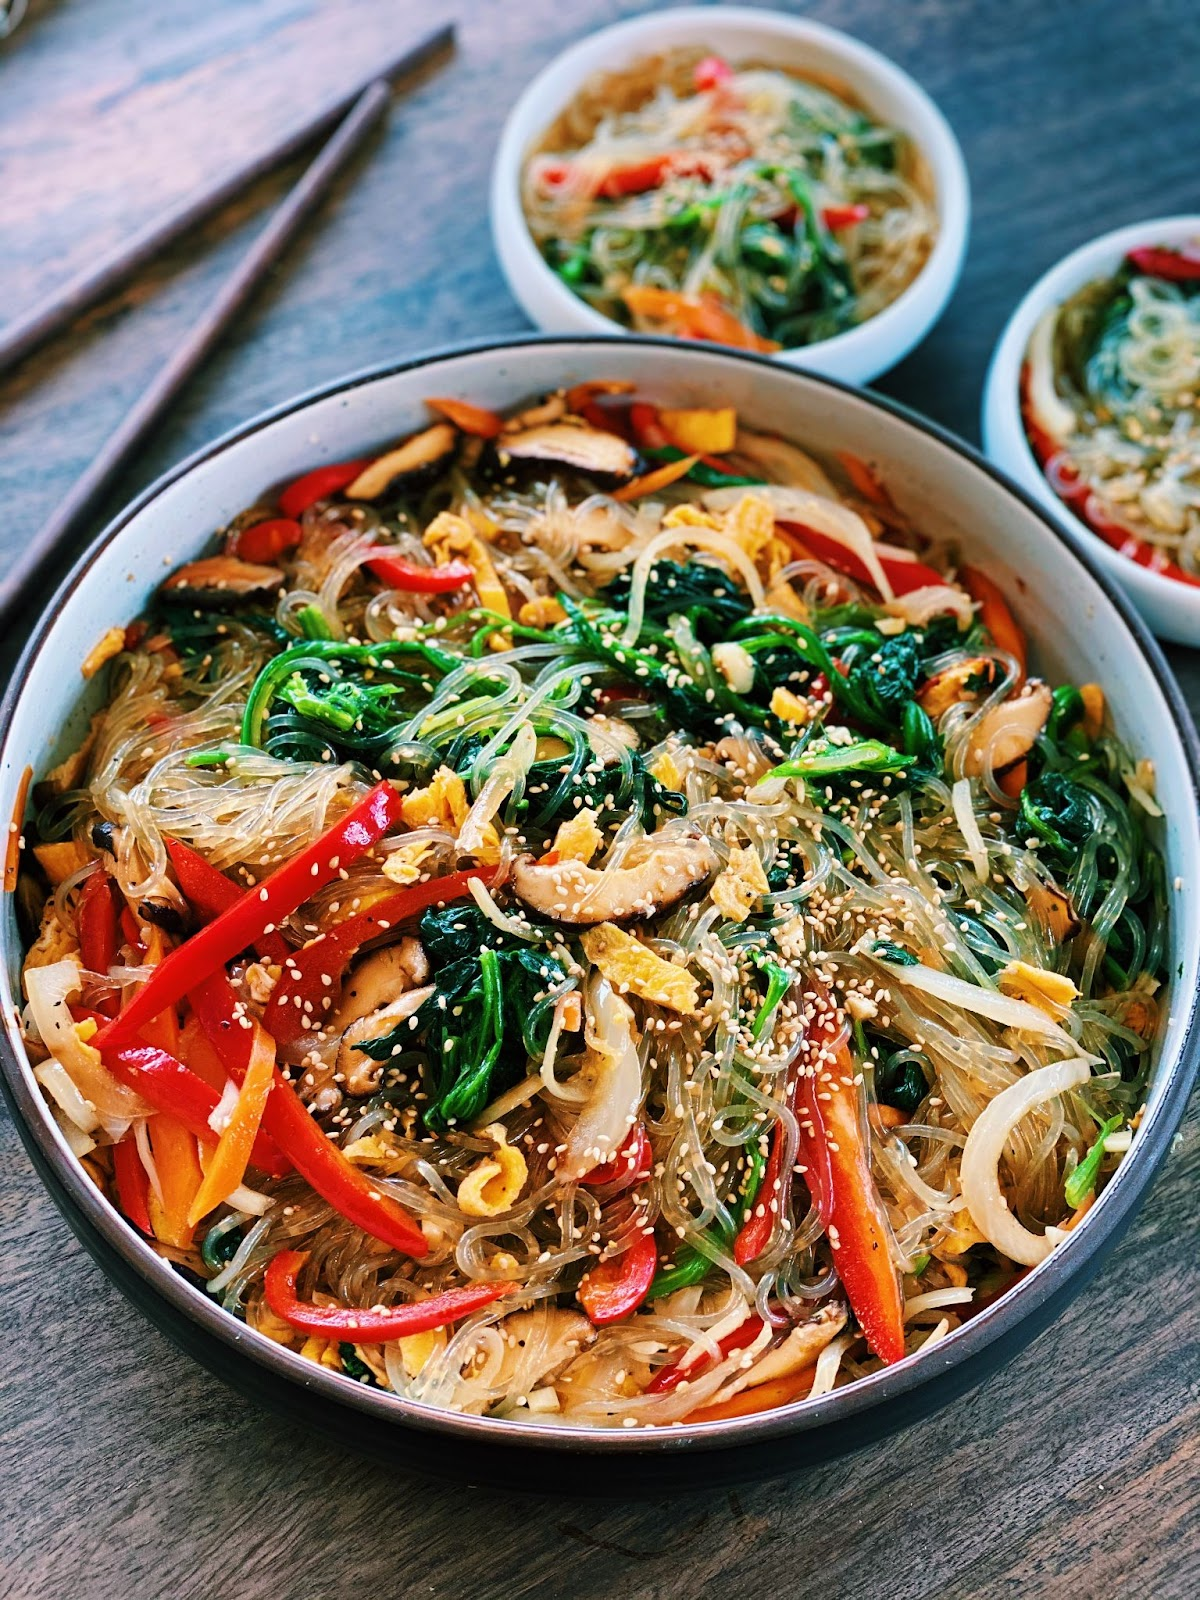 Vegetarian Japchae - Korean Glass Noodle Stir-fry